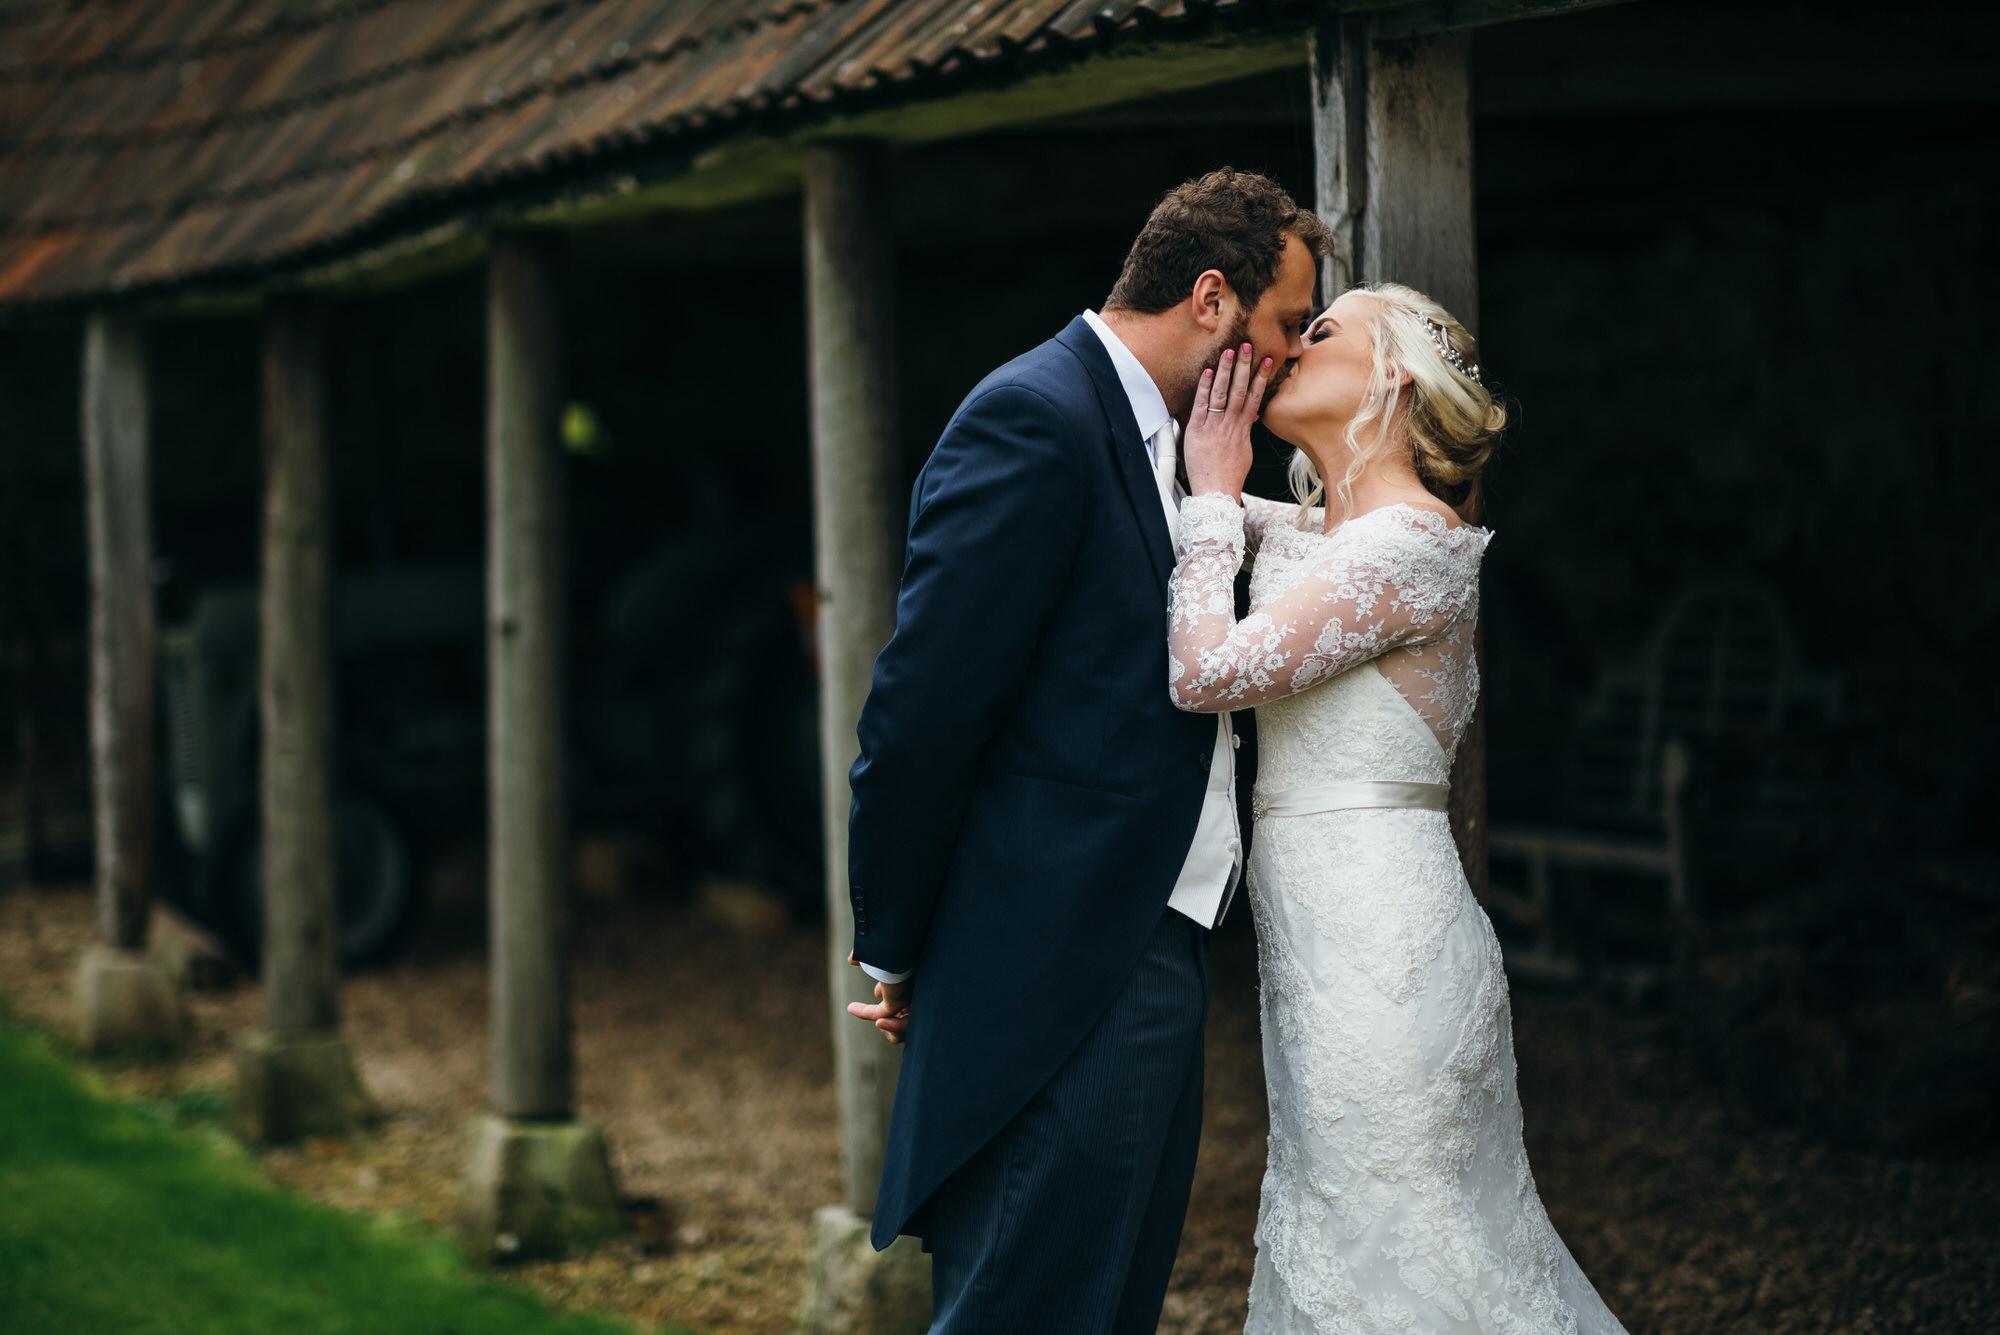 Best wedding photography 2017 110